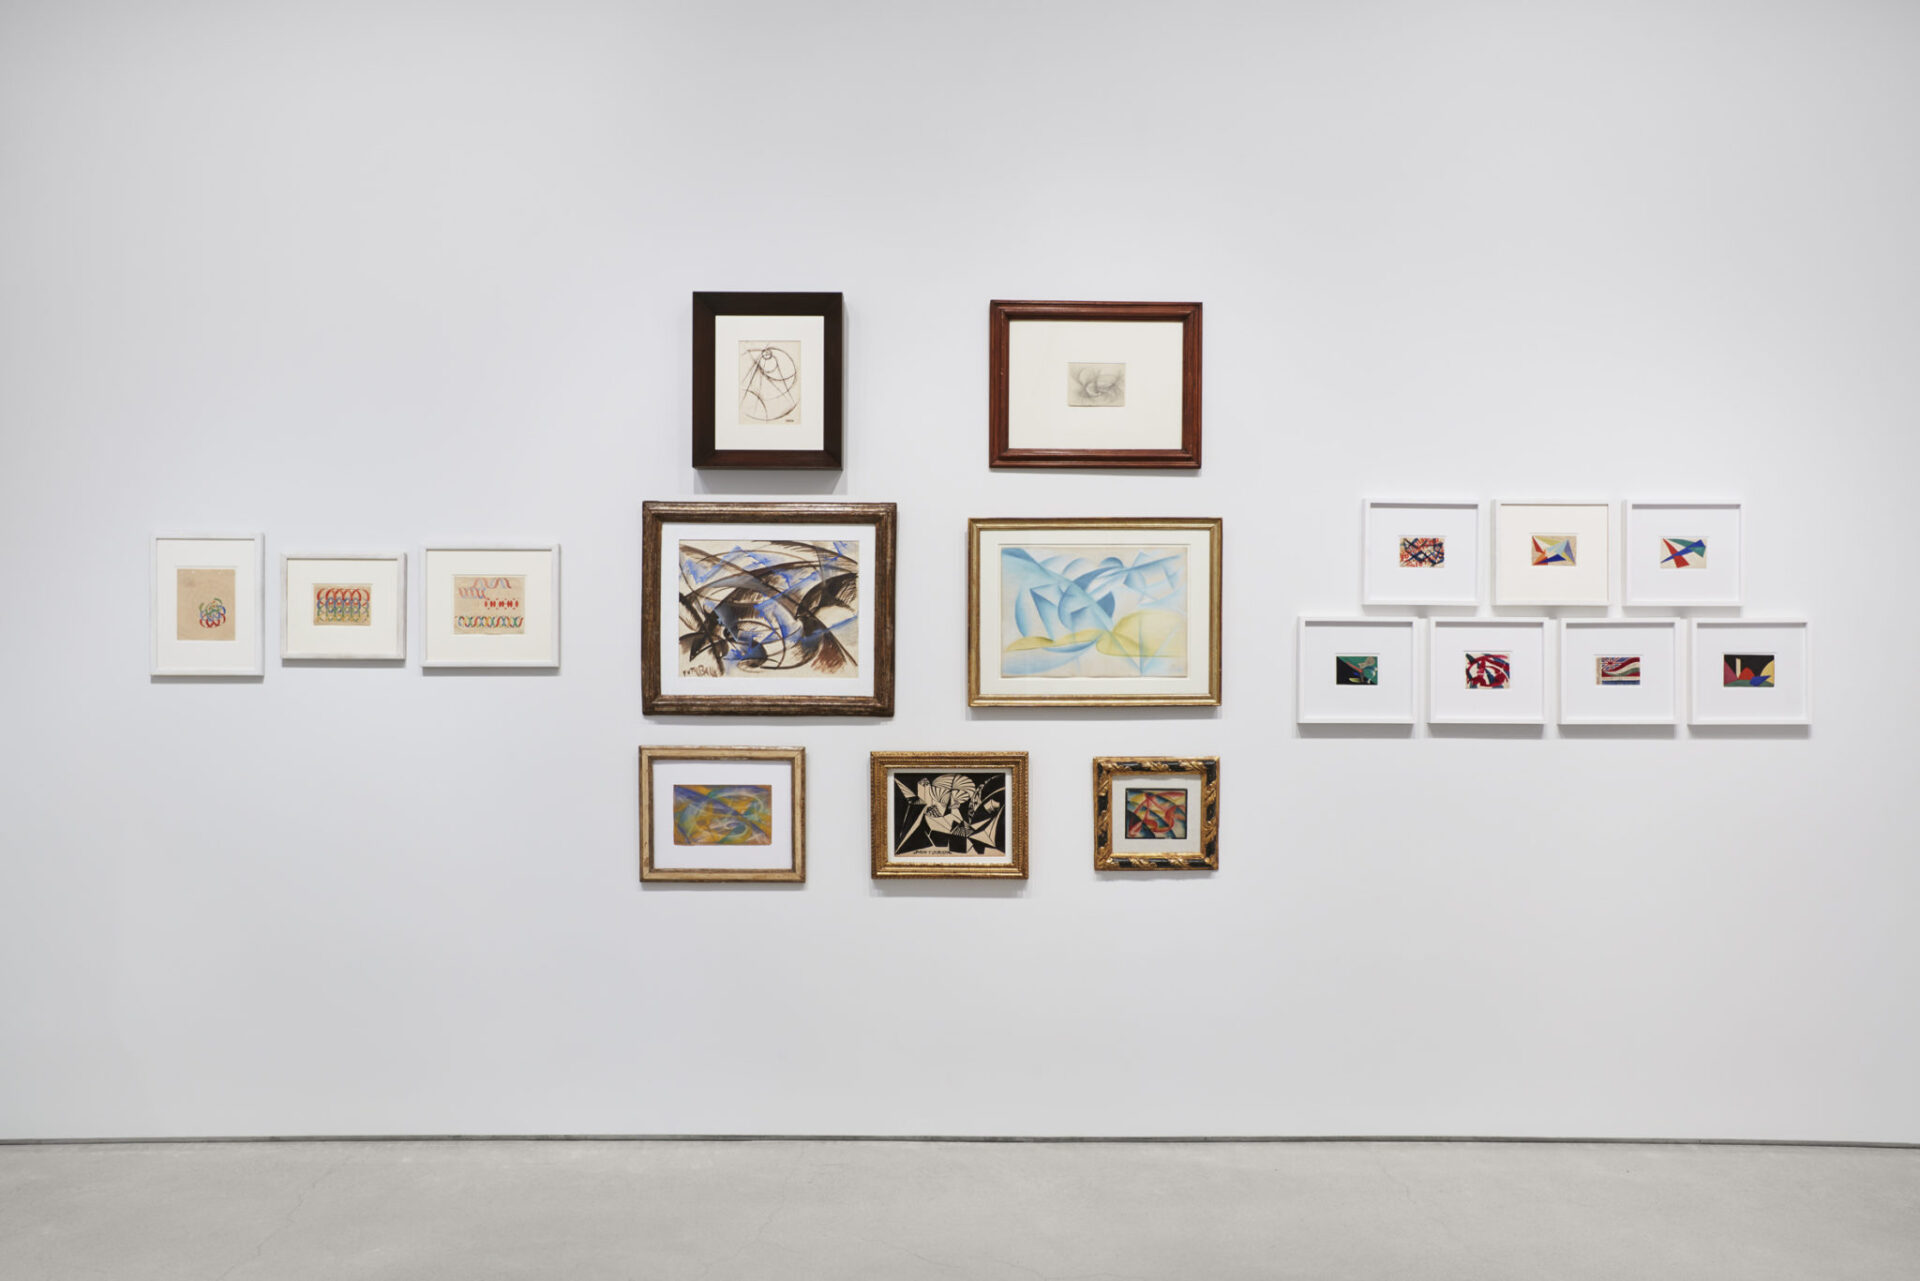 Giacomo Balla's works, Courtesy Sperone Westwater, New York